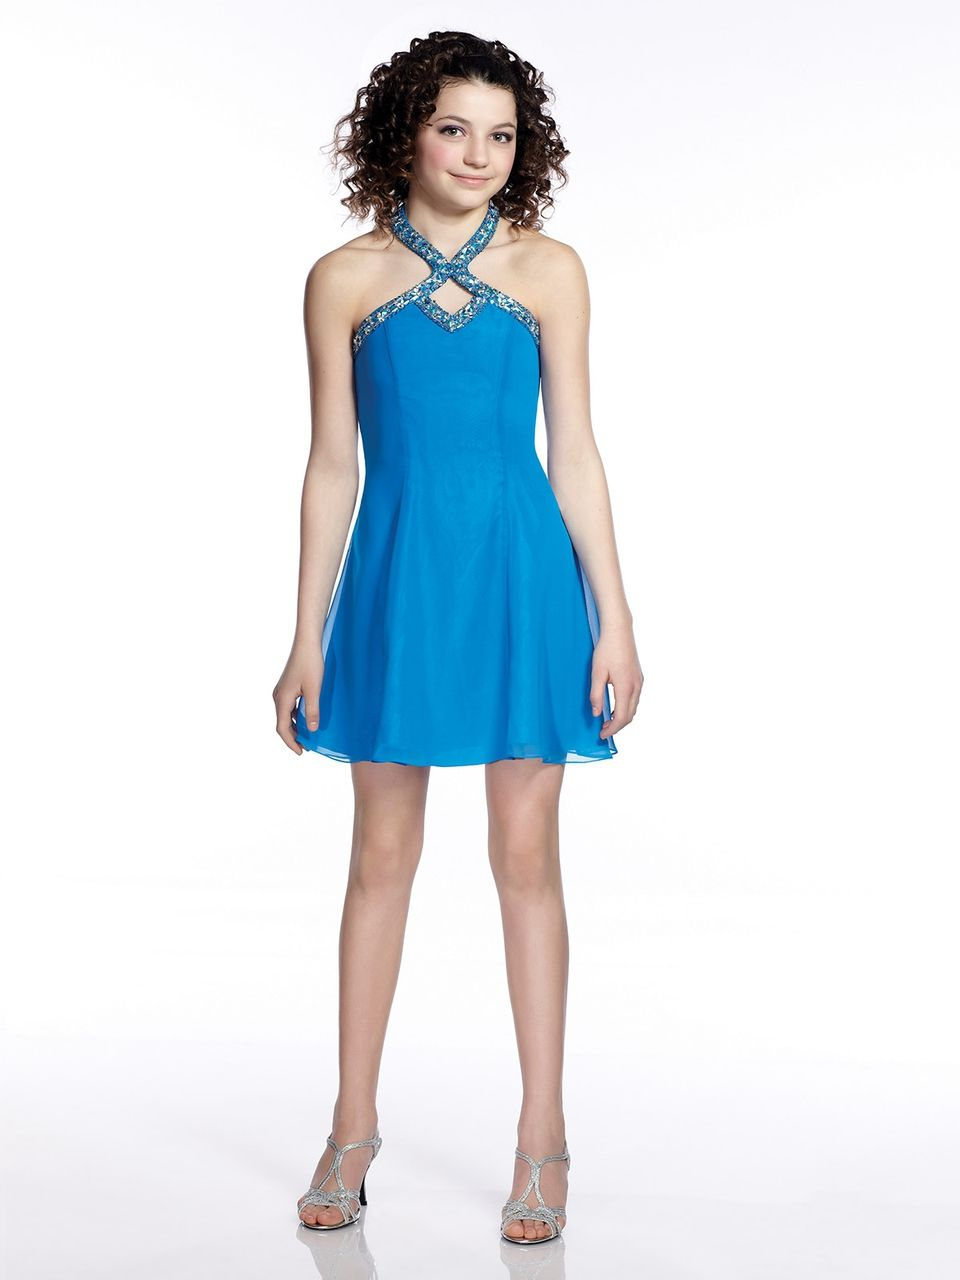 Lexie Girls Cocktail Dress TW21541 | Junior party dresses ...